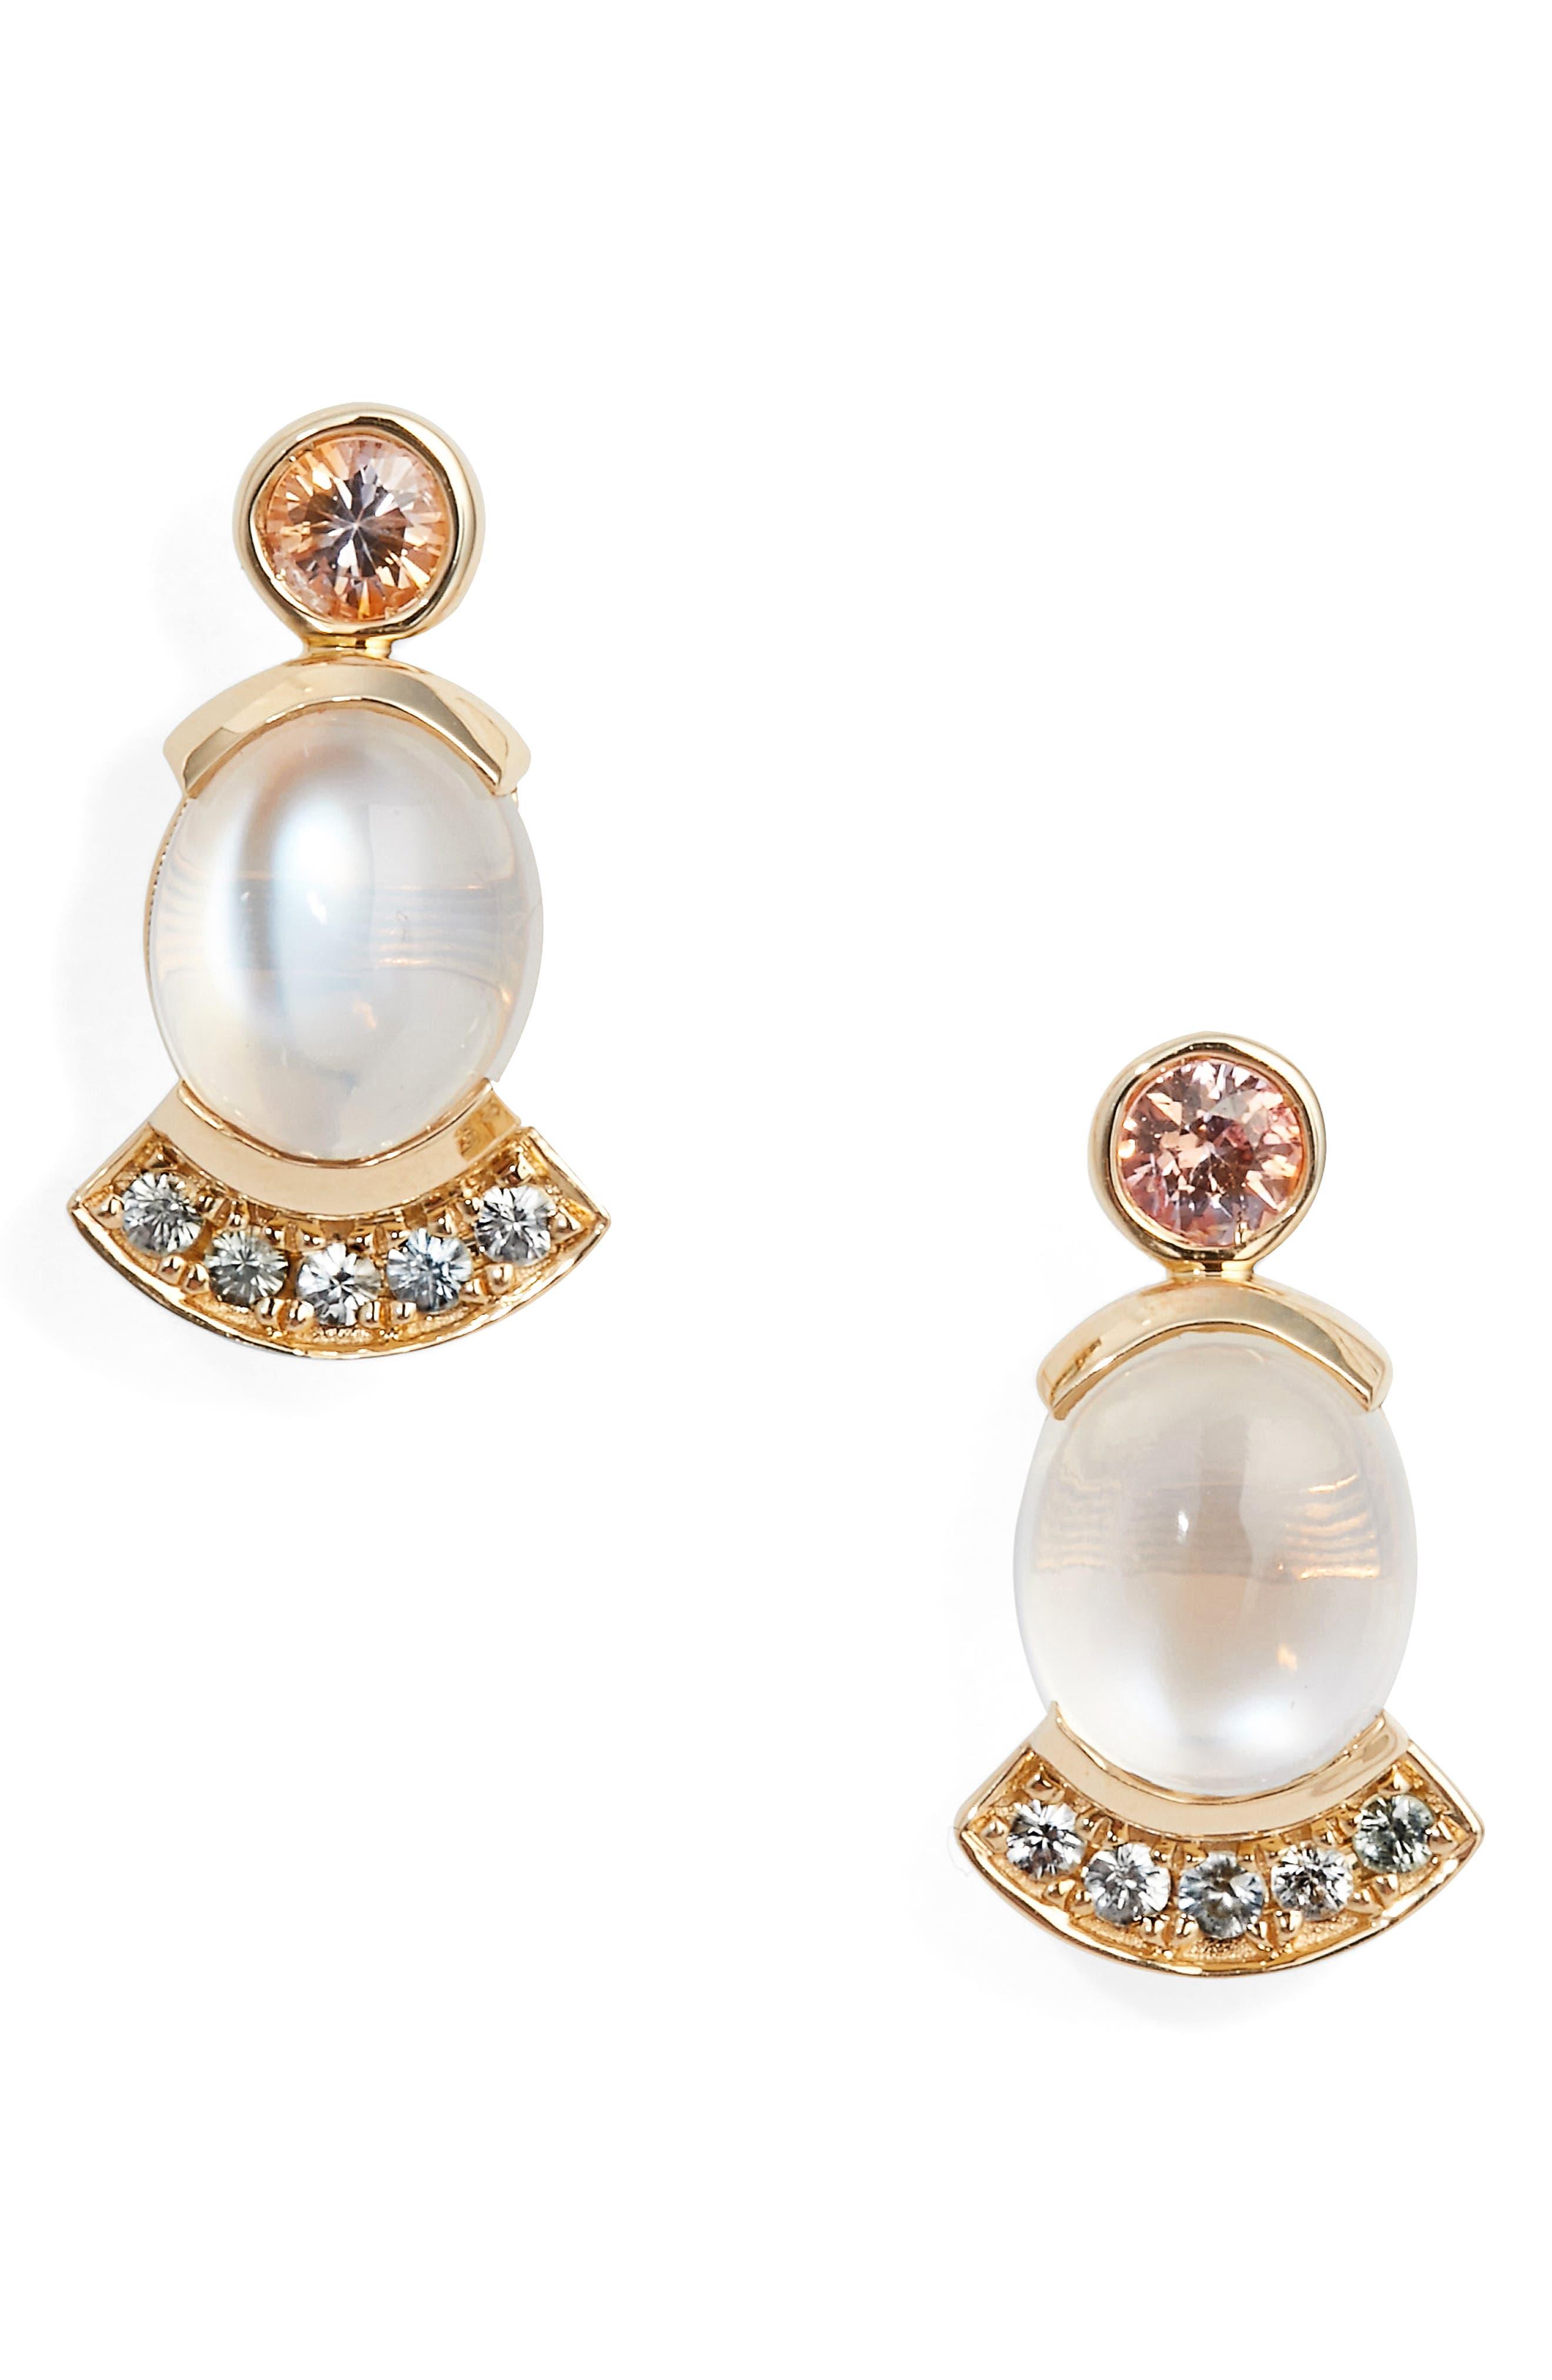 Moonstone & Sapphire Drop Earrings,                             Main thumbnail 1, color,                             Yellow Gold